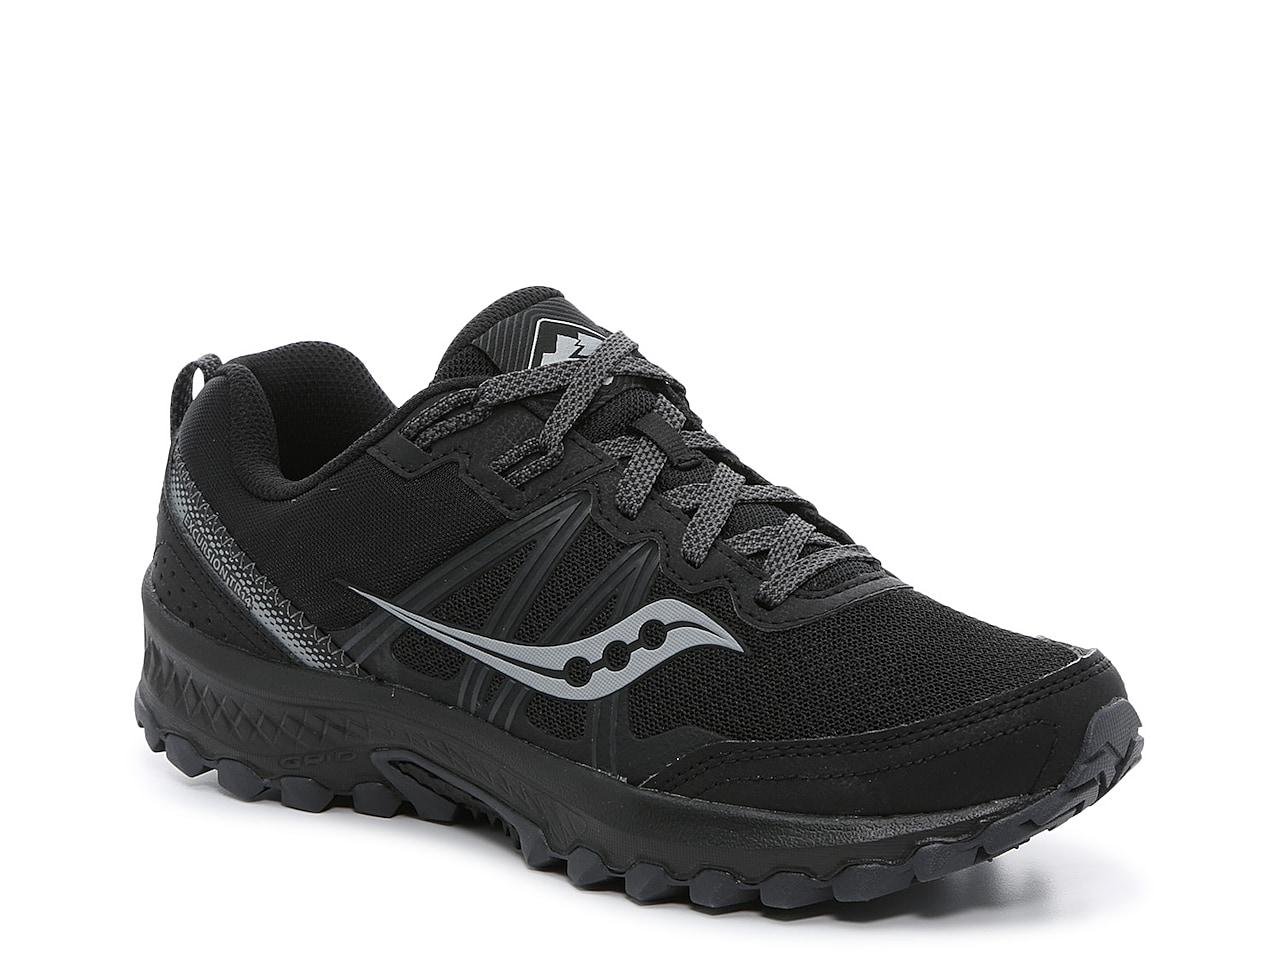 Excursion TR 14 Trail Running Shoe - Men's